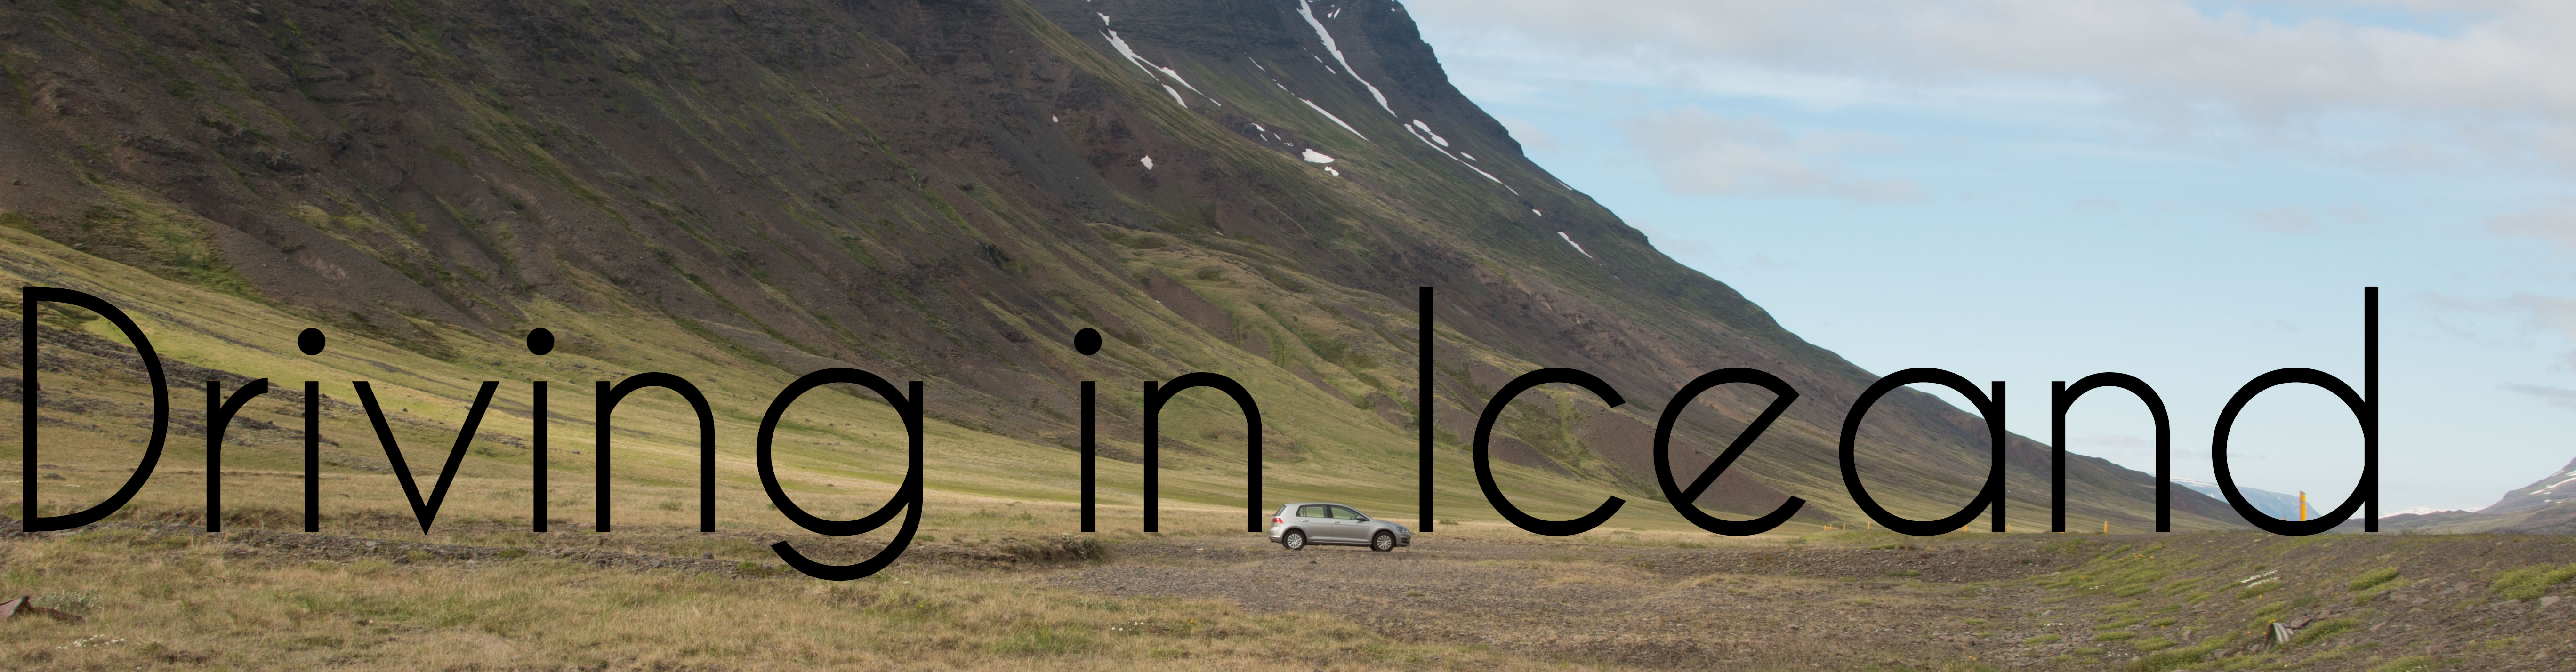 "<img src=""data:image/gif;base64,R0lGODdhAQABAPAAAP///wAAACwAAAAAAQABAEACAkQBADs="" data-lazy-src=""images/"" width=""800"" height=""600"" alt=""iceland - driving - Iceland: How to get the most on a budget"">"